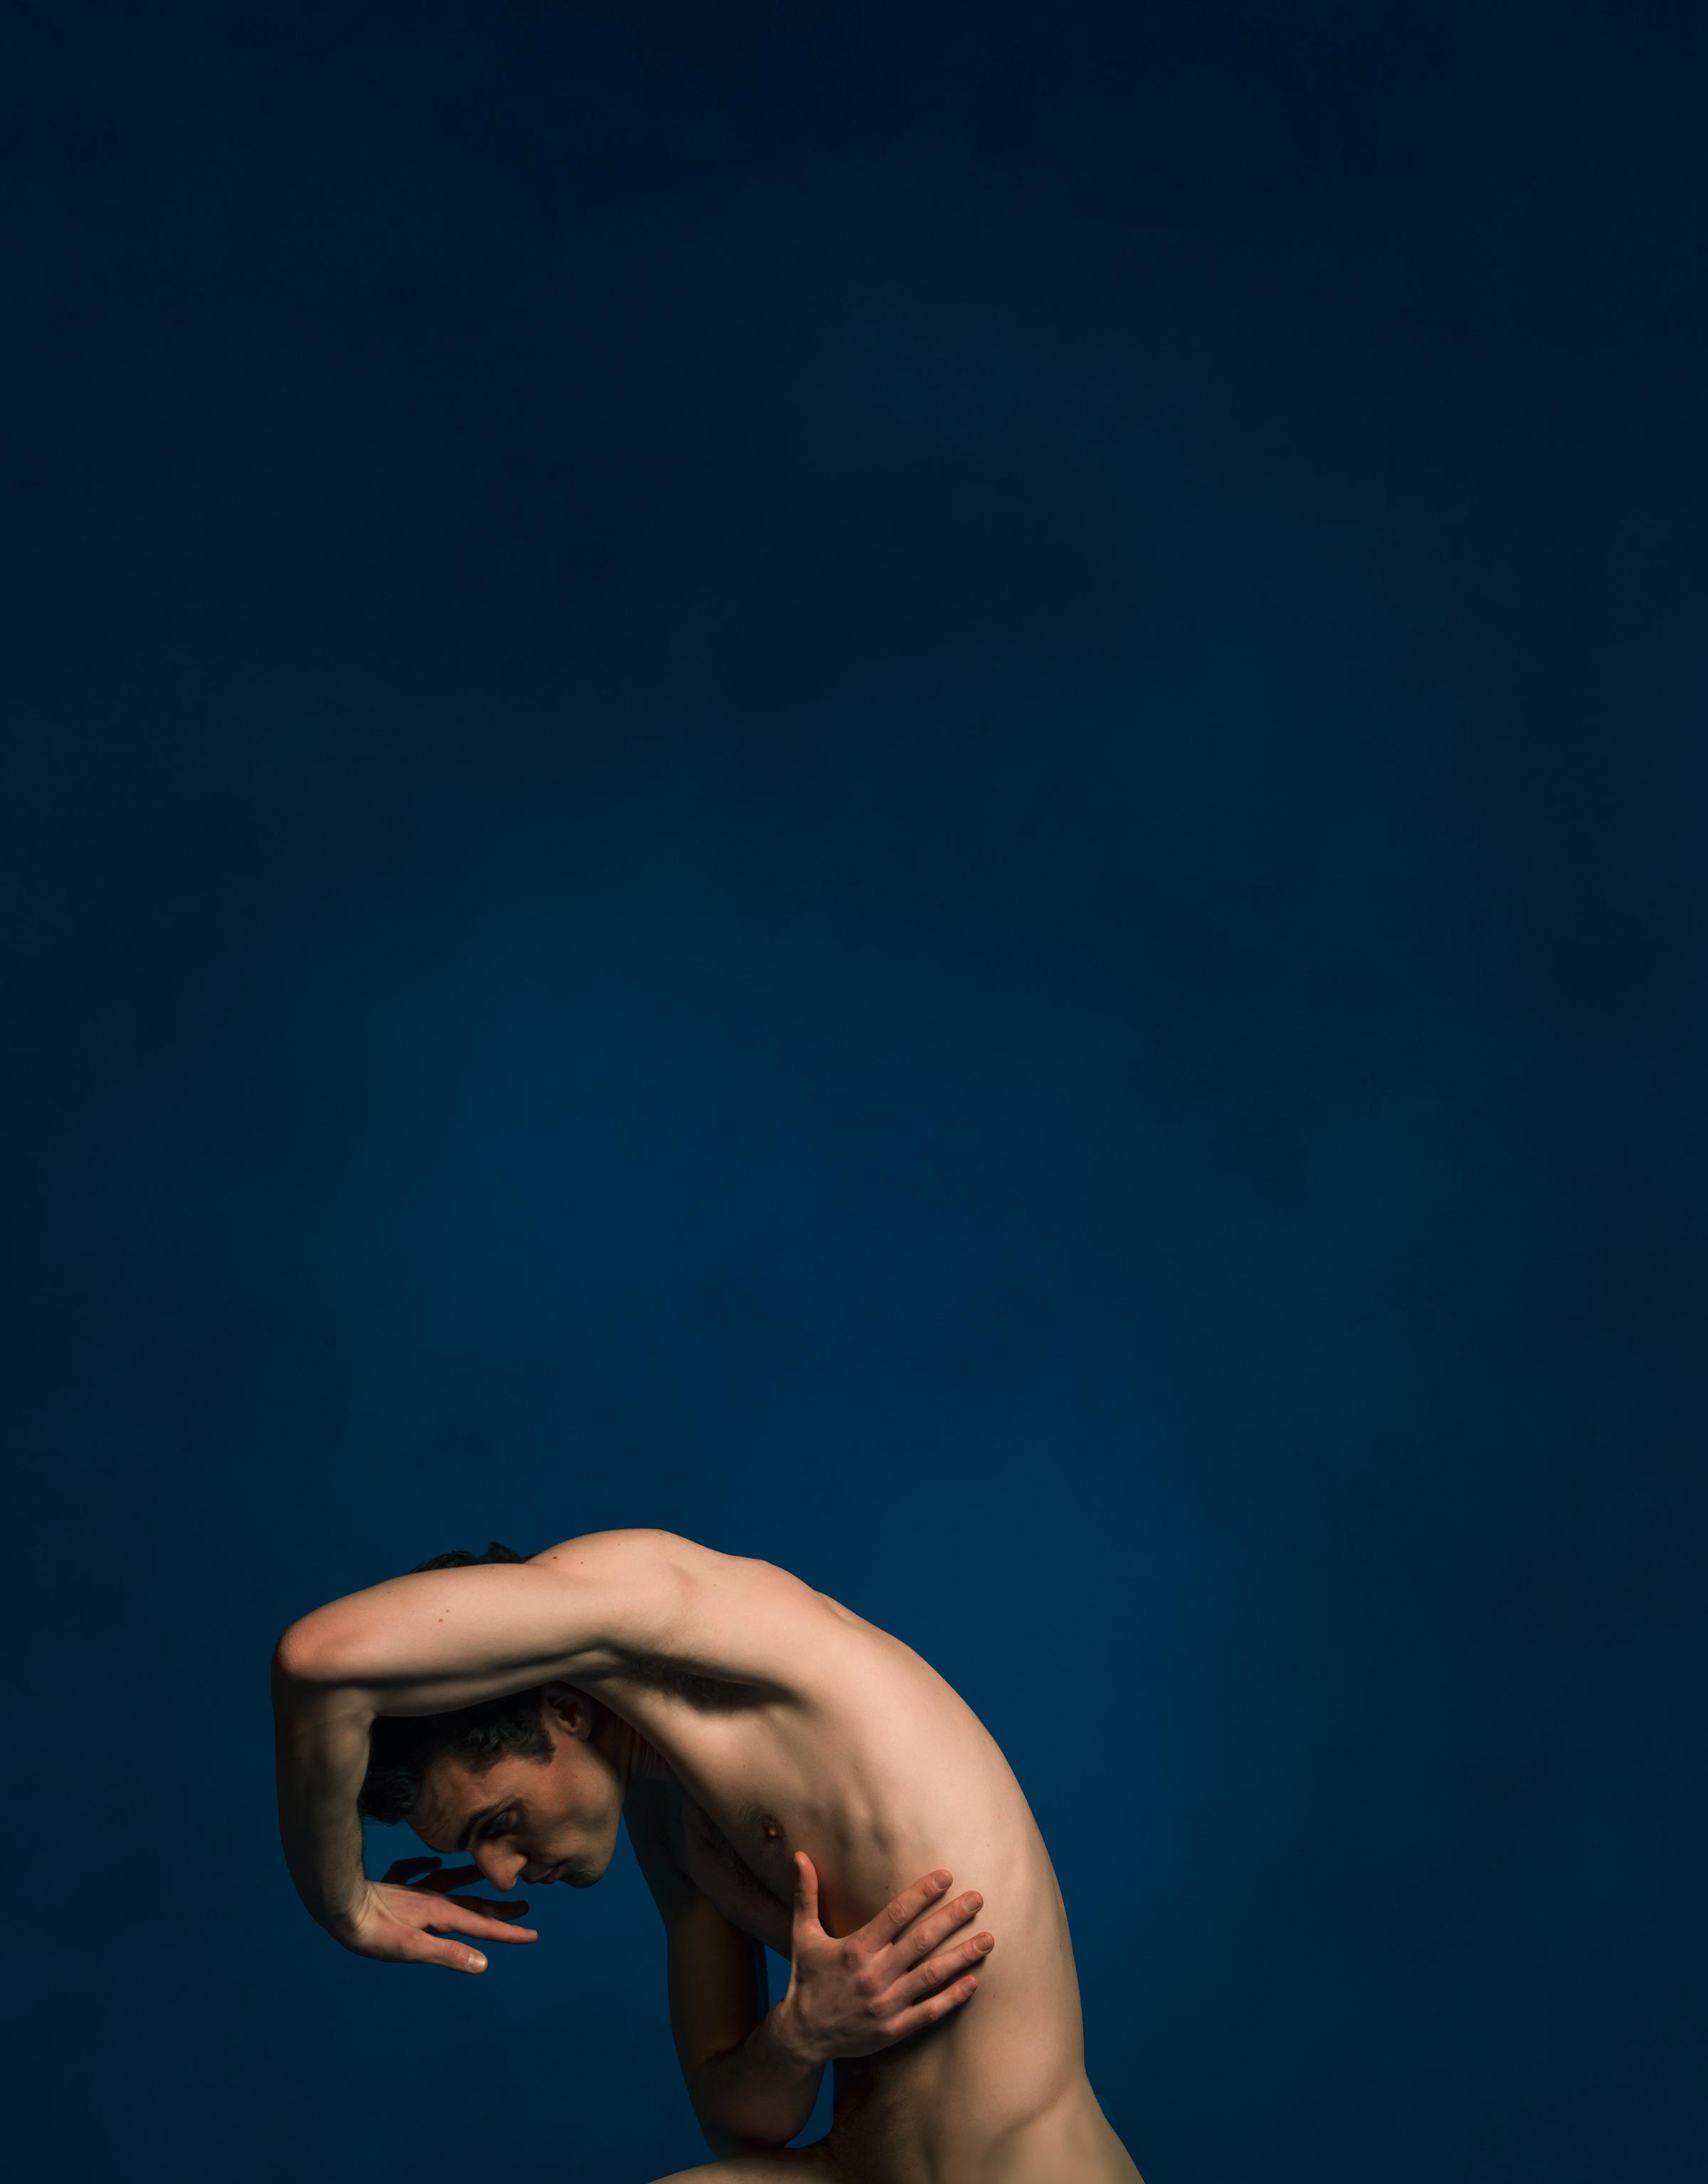 Grands Ballets A saison 2015 Damian Siqueiros  Generique-Sam-2121.jpg